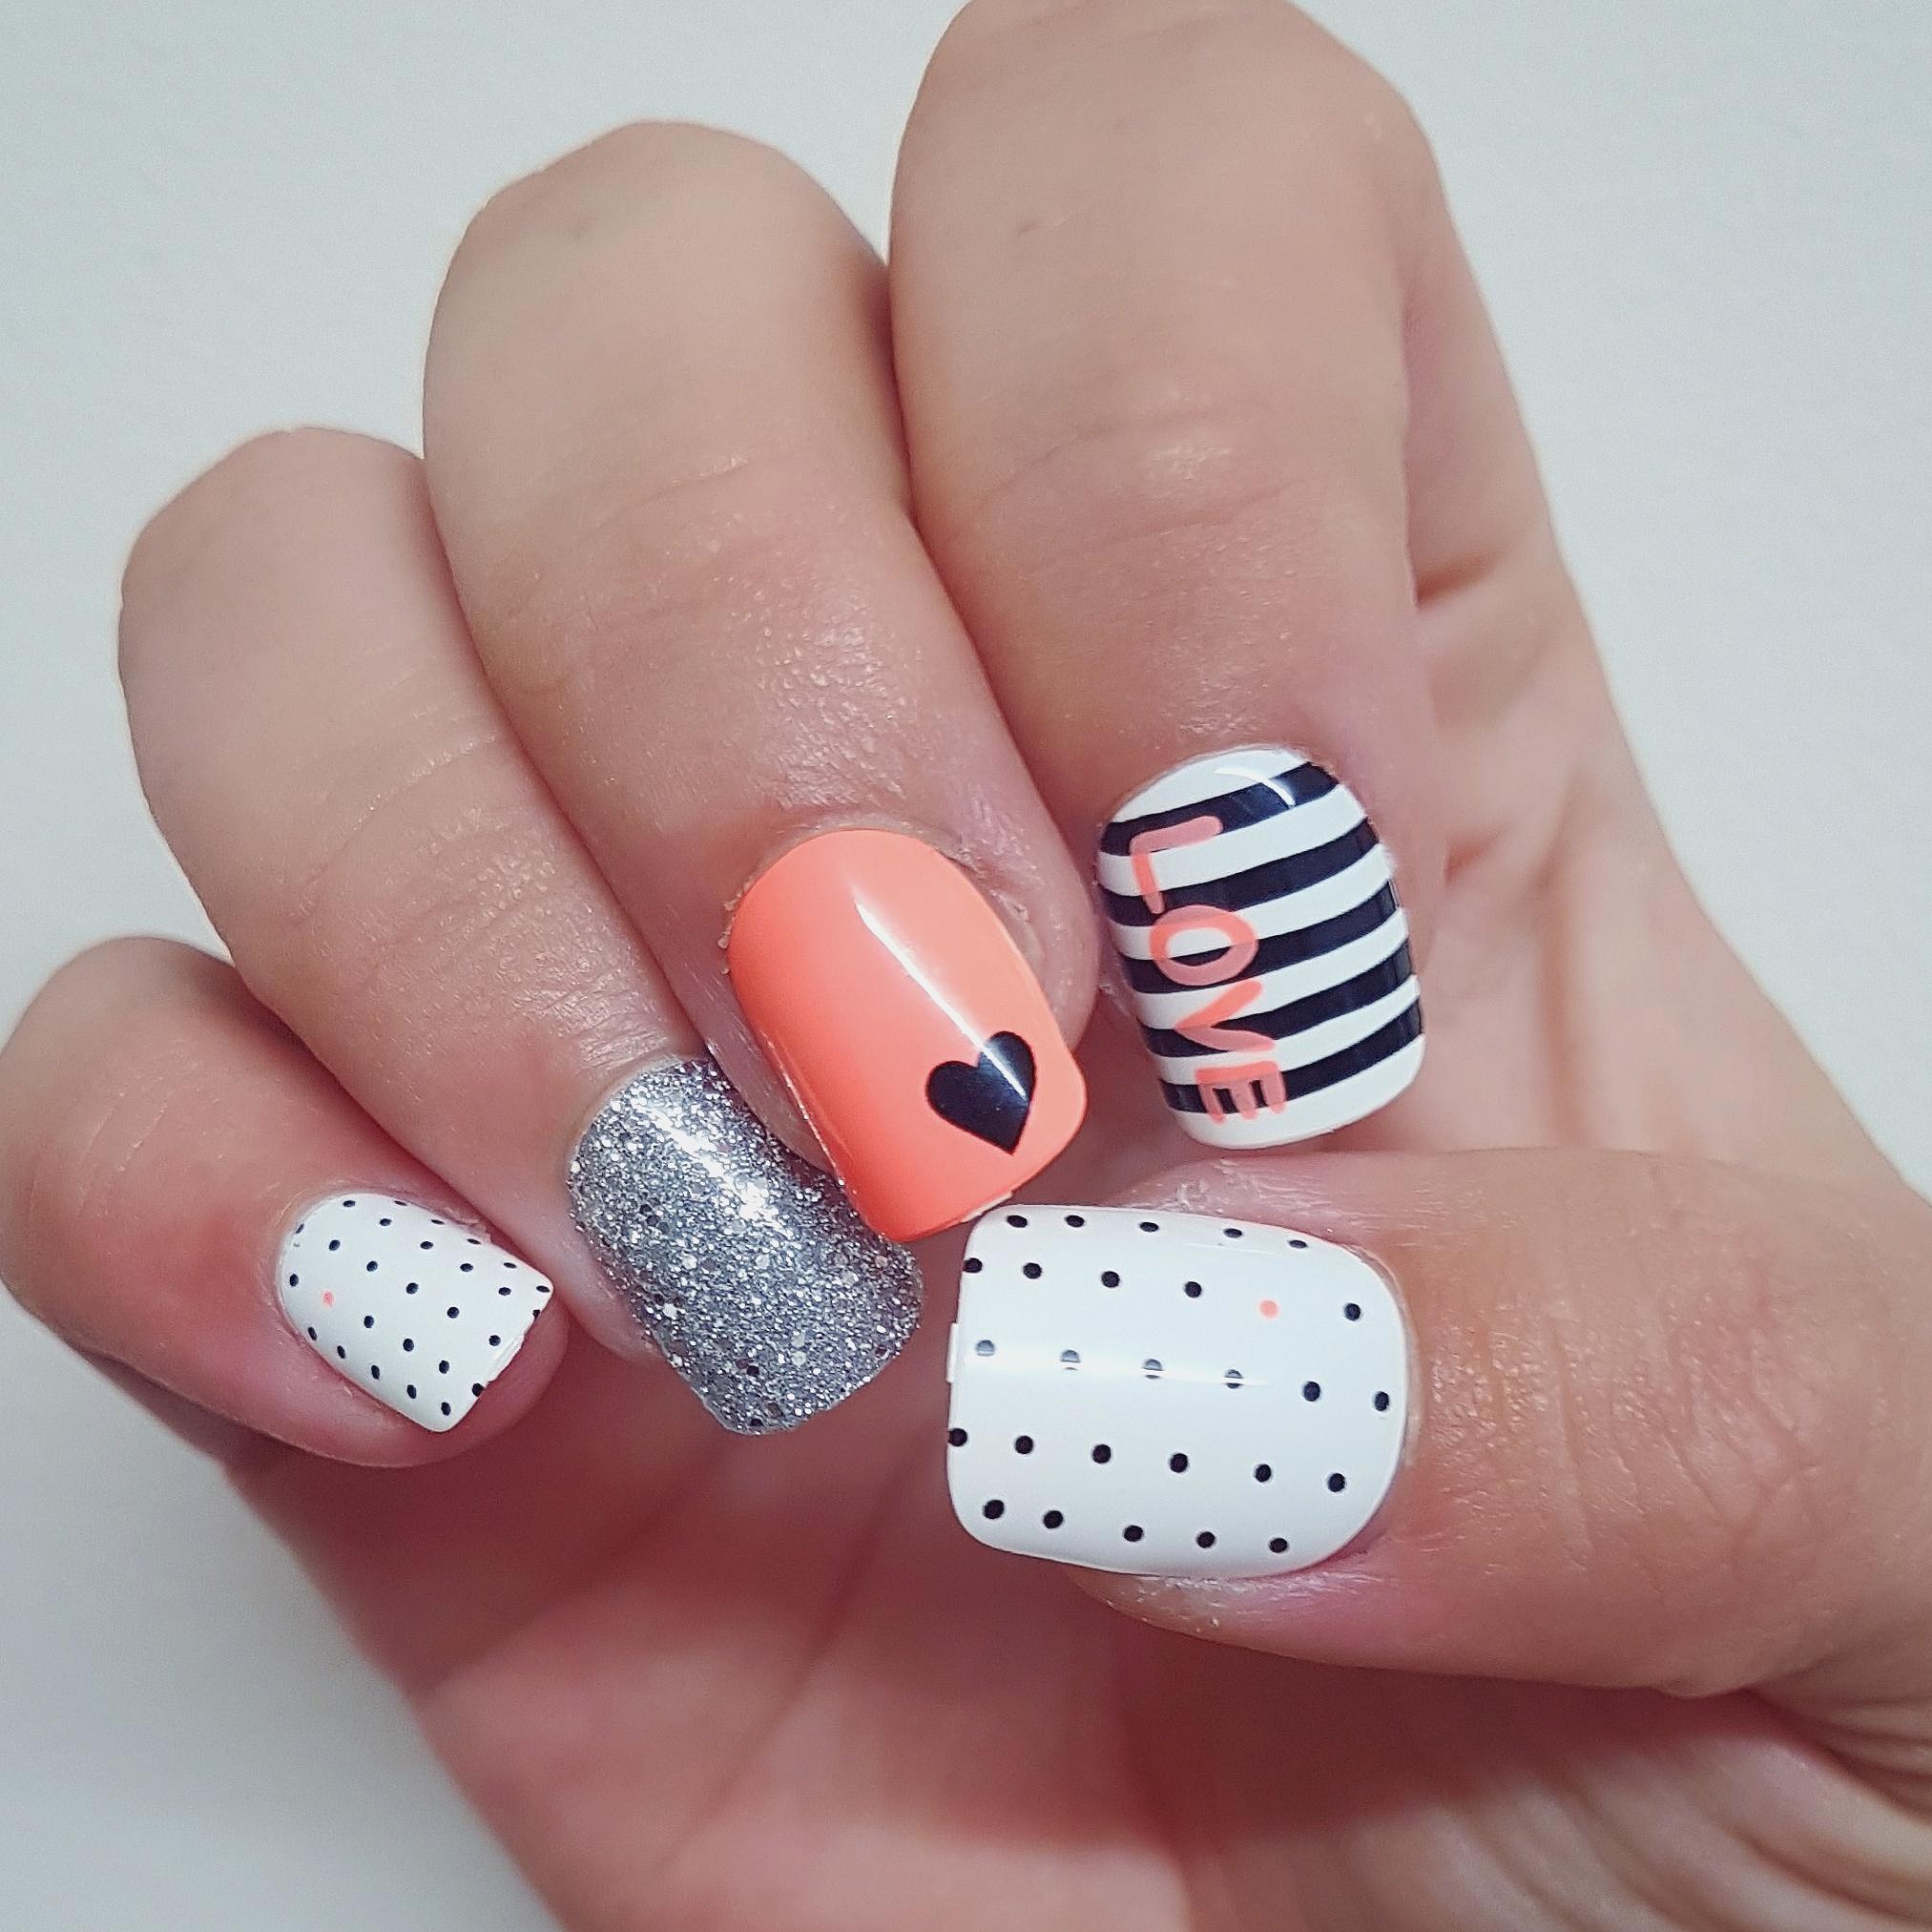 Impress Press On Nails Designs